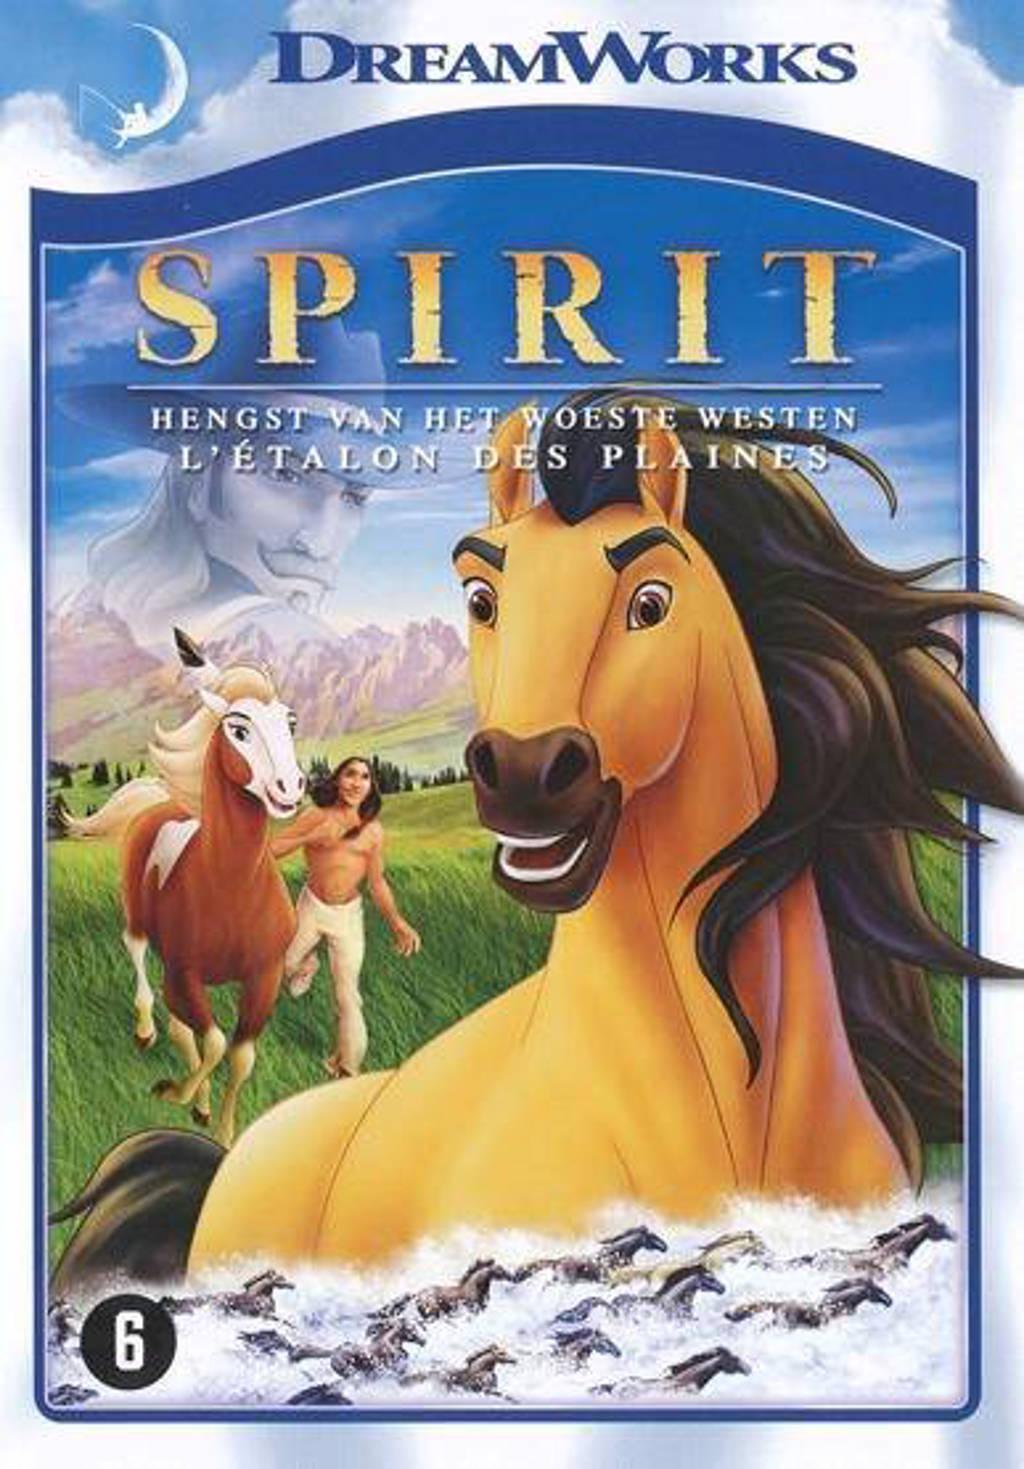 Spirit - Stallion of Cimarron (DVD)